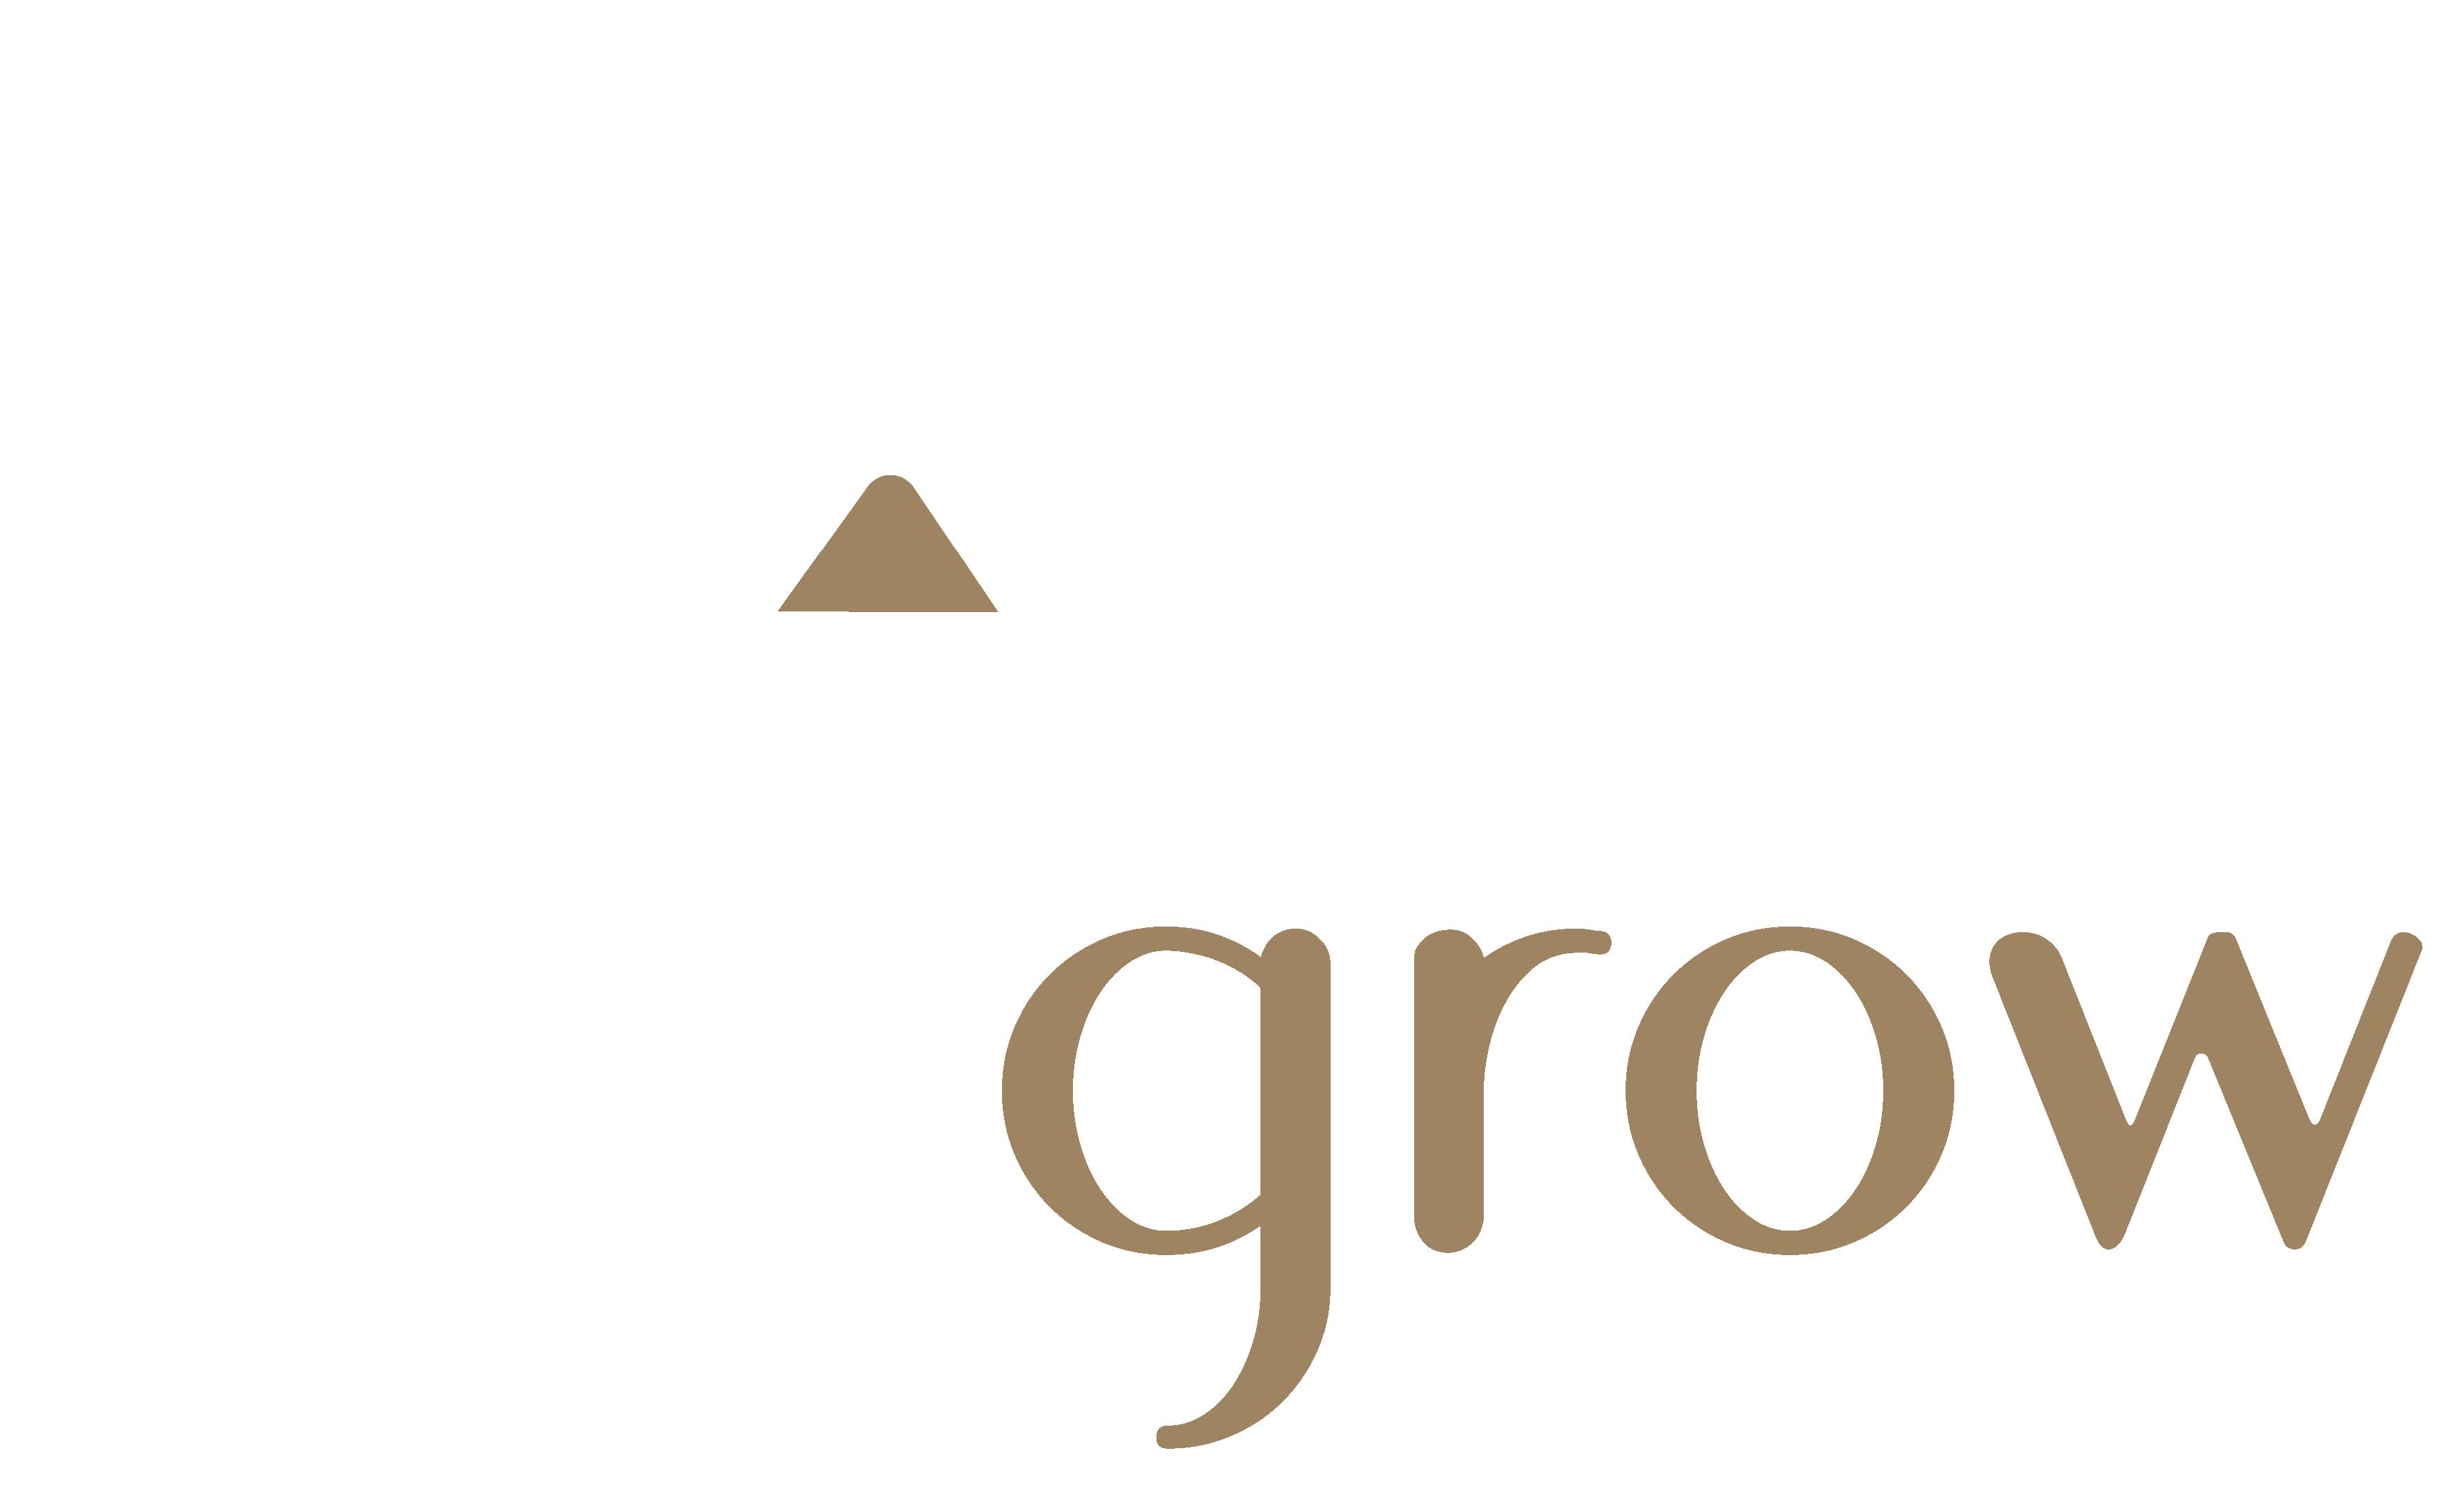 ExcelGrow